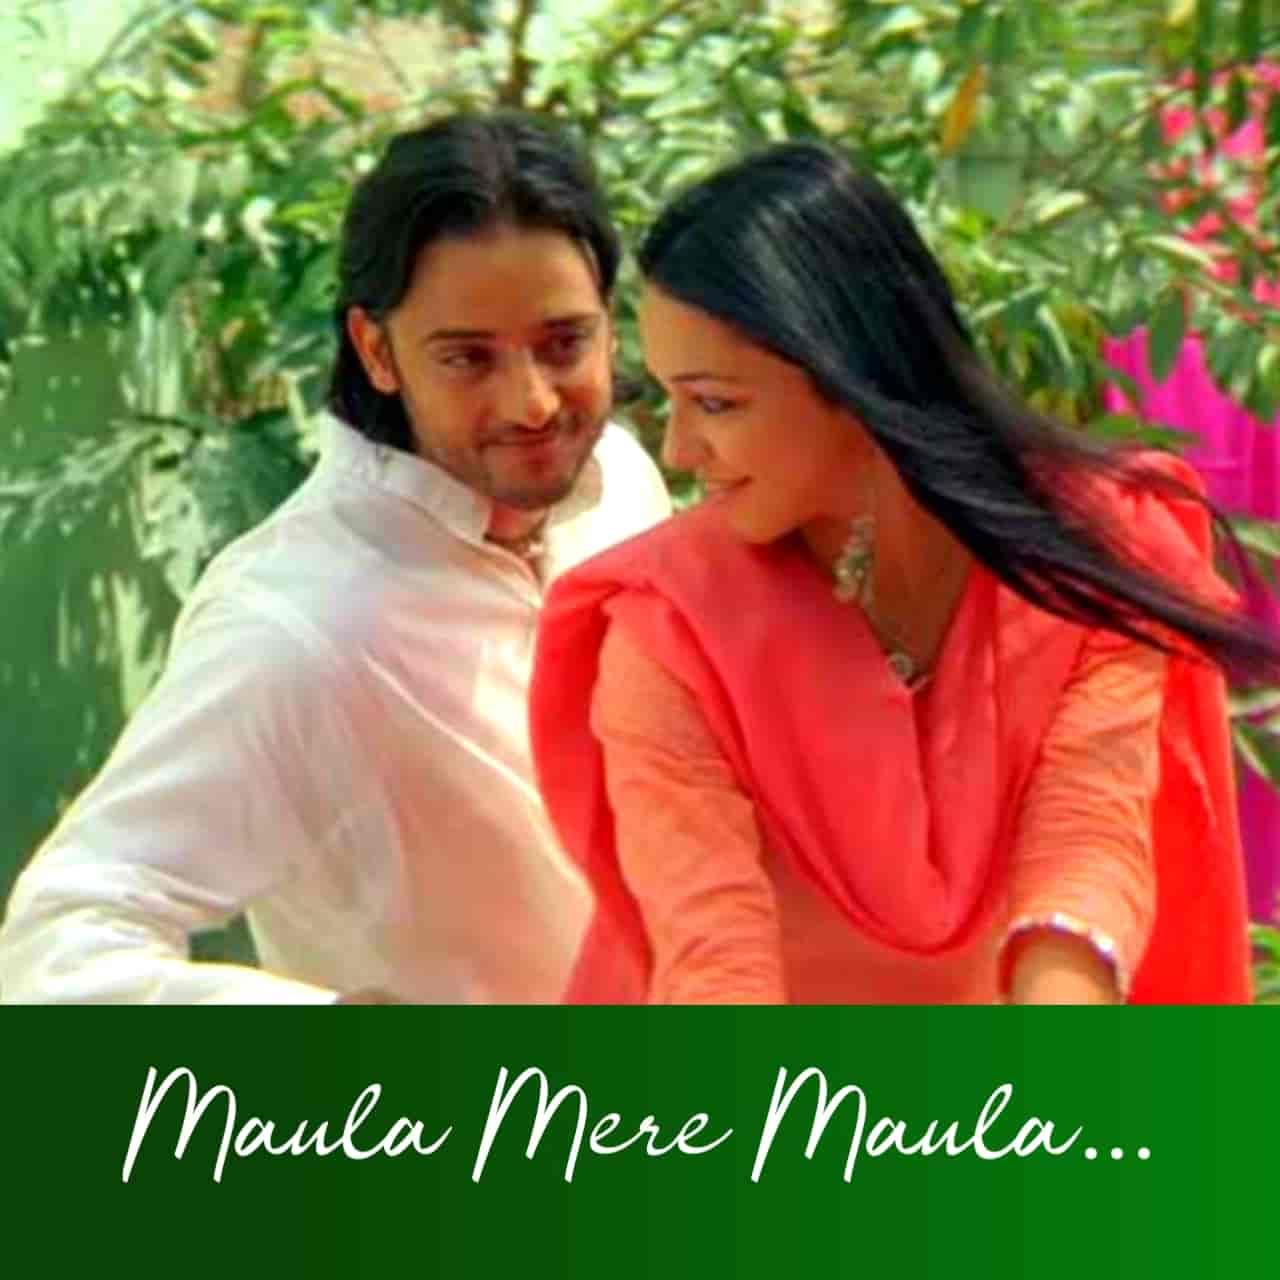 Maula Mere Maula Hindi Love Song Lyrics, Sung By Roop Kumar Rathod.